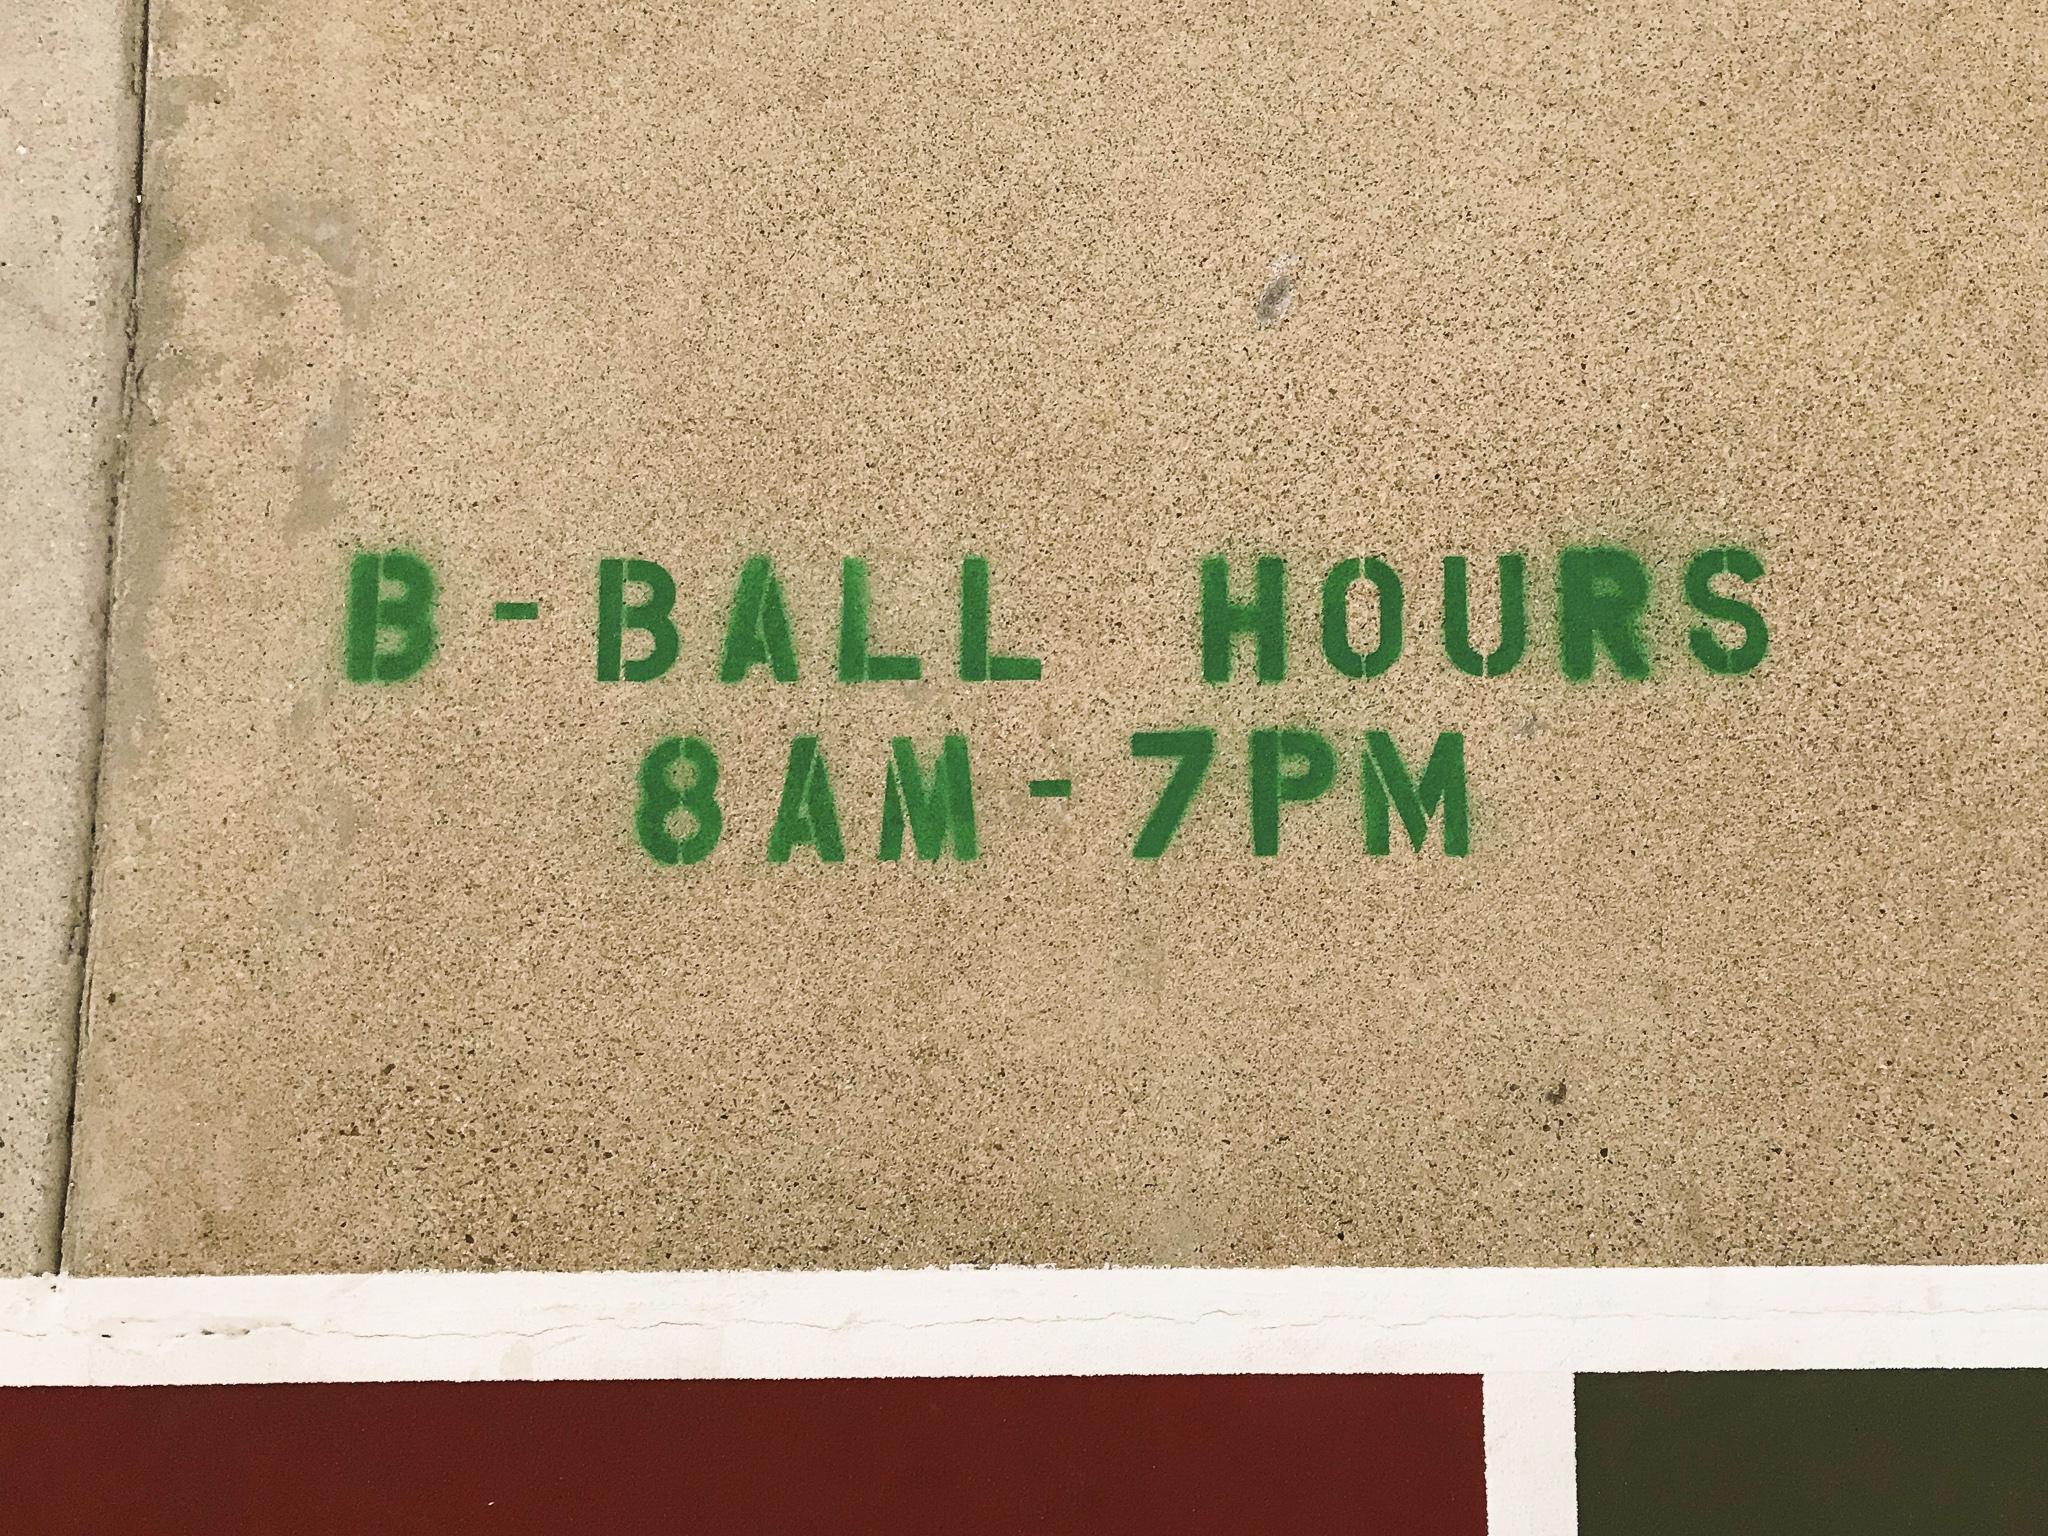 38th Street Basketball Court California Newport Beach